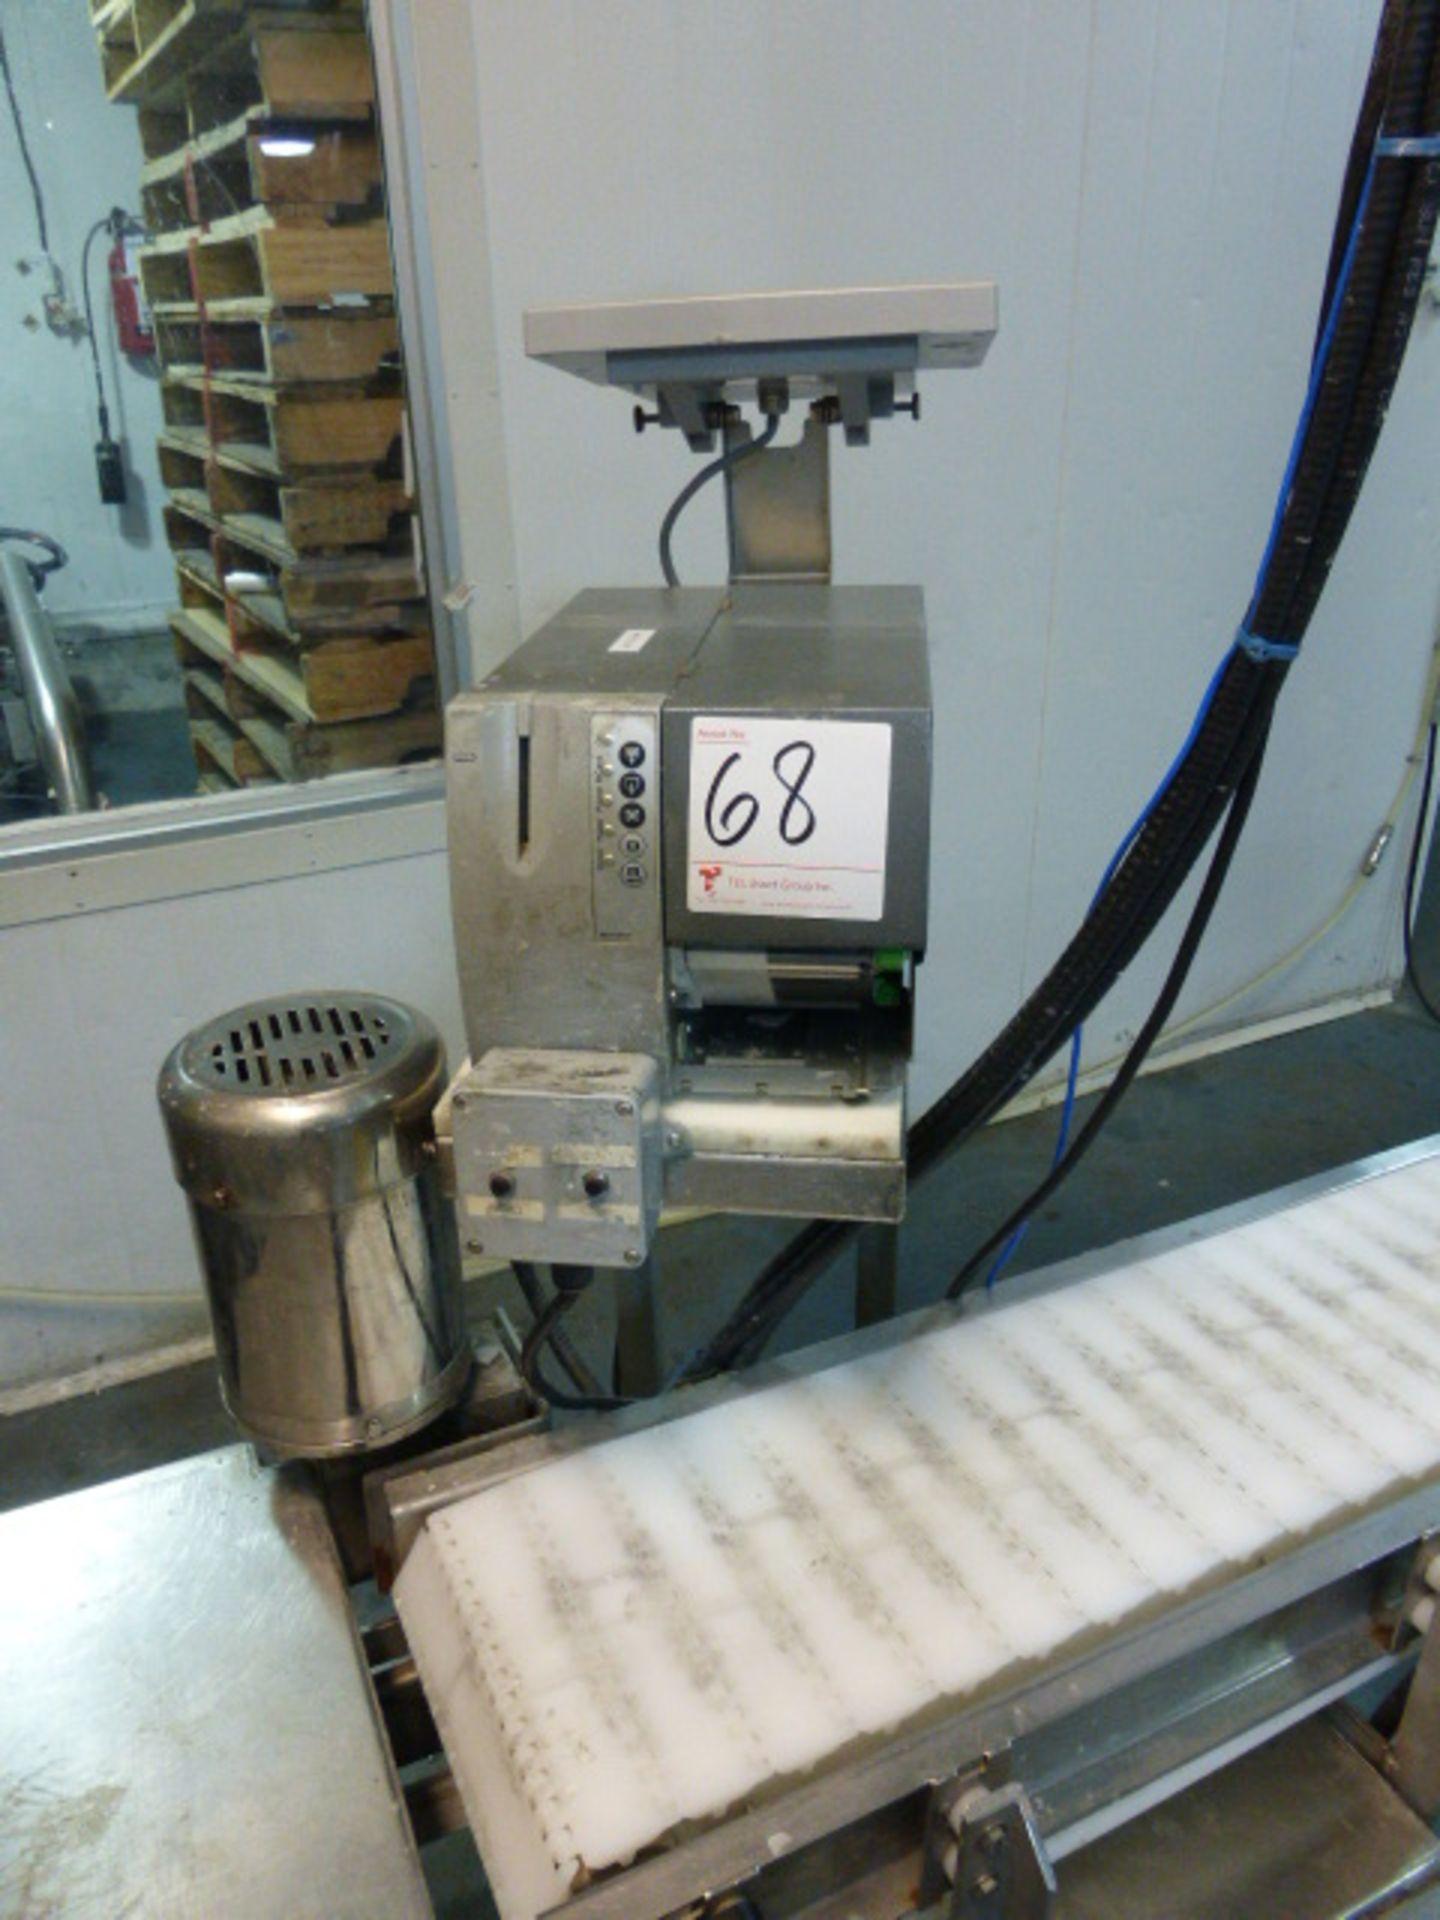 Lot 68 - Bizerba label printer, mod. GLP, ser. no. 10858843